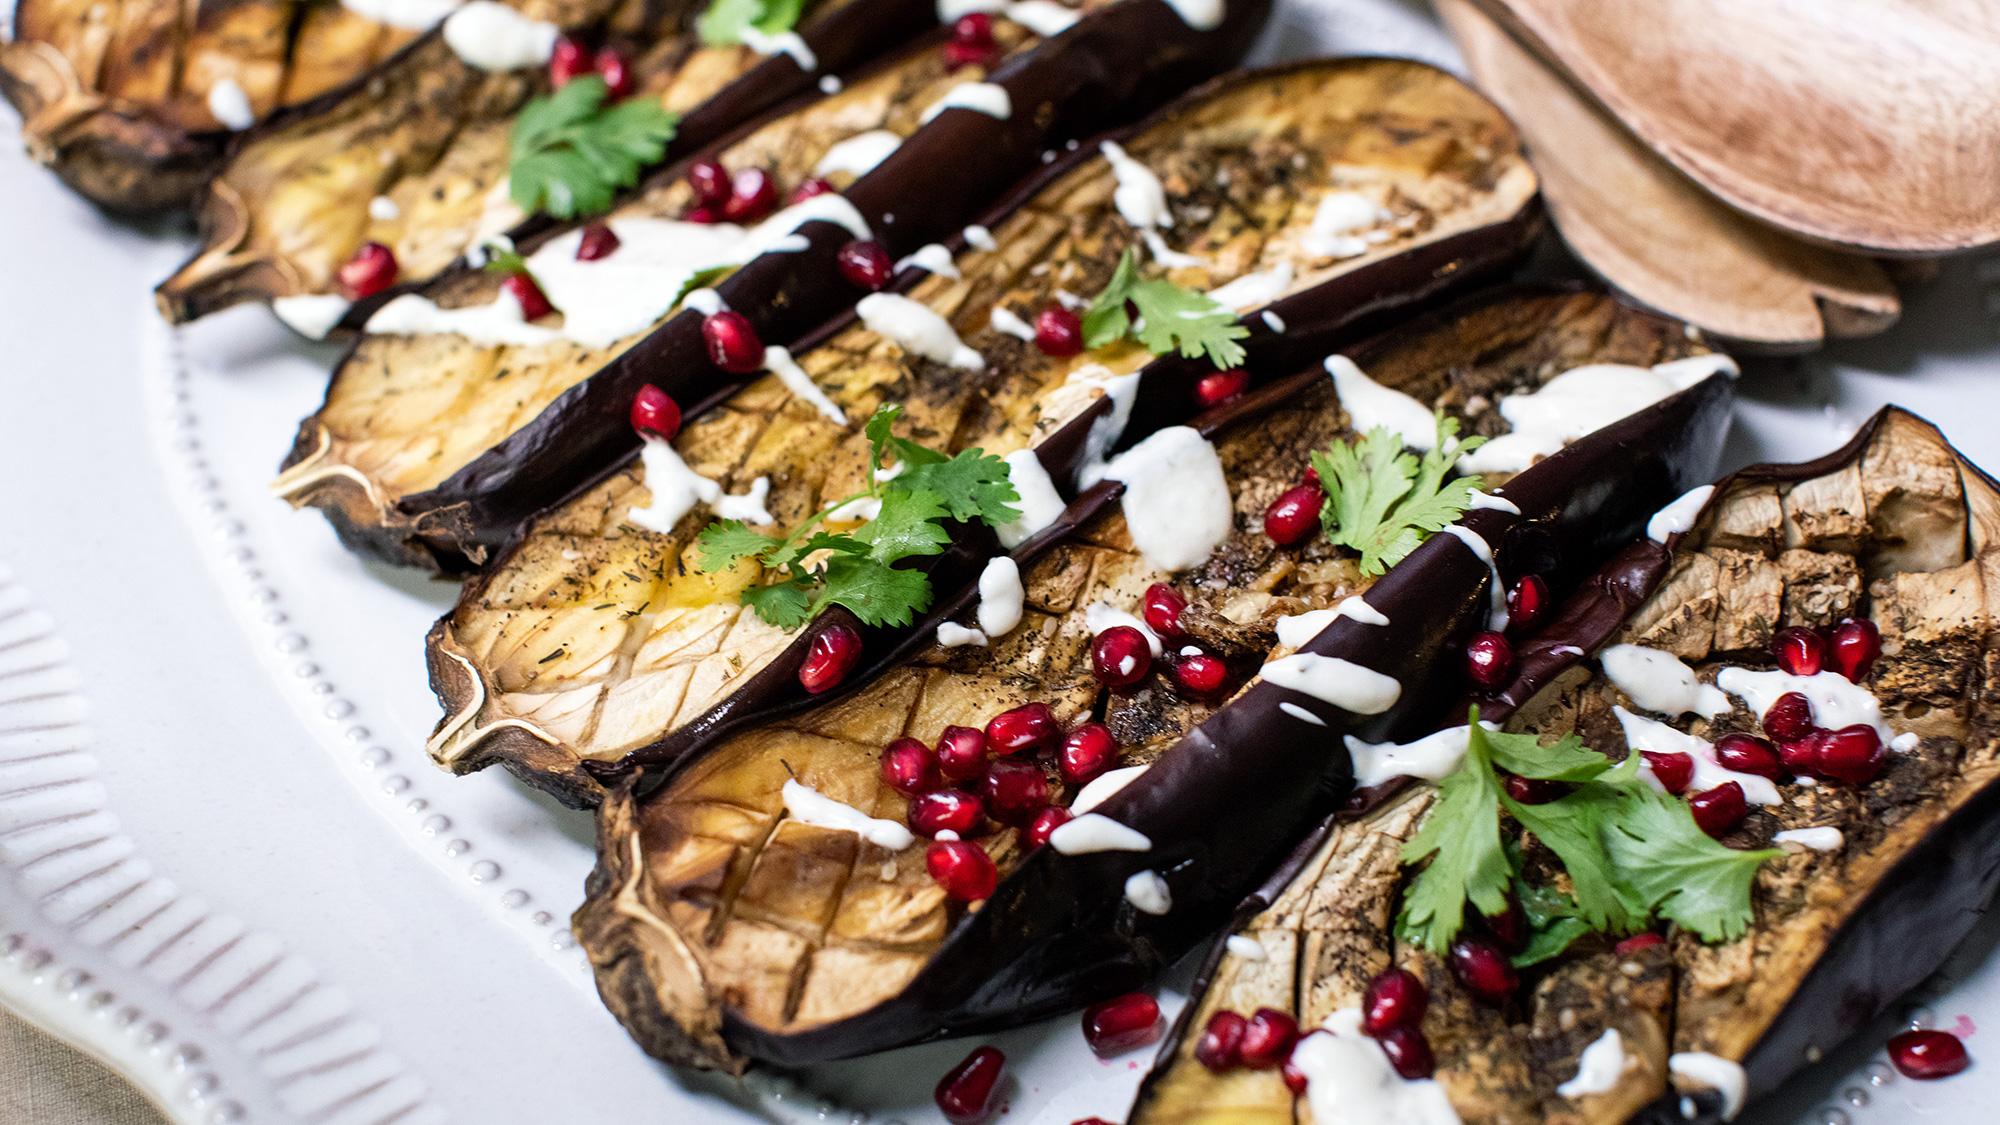 McCormick Gourmet Roasted Eggplant with Za'atar Yogurt Sauce